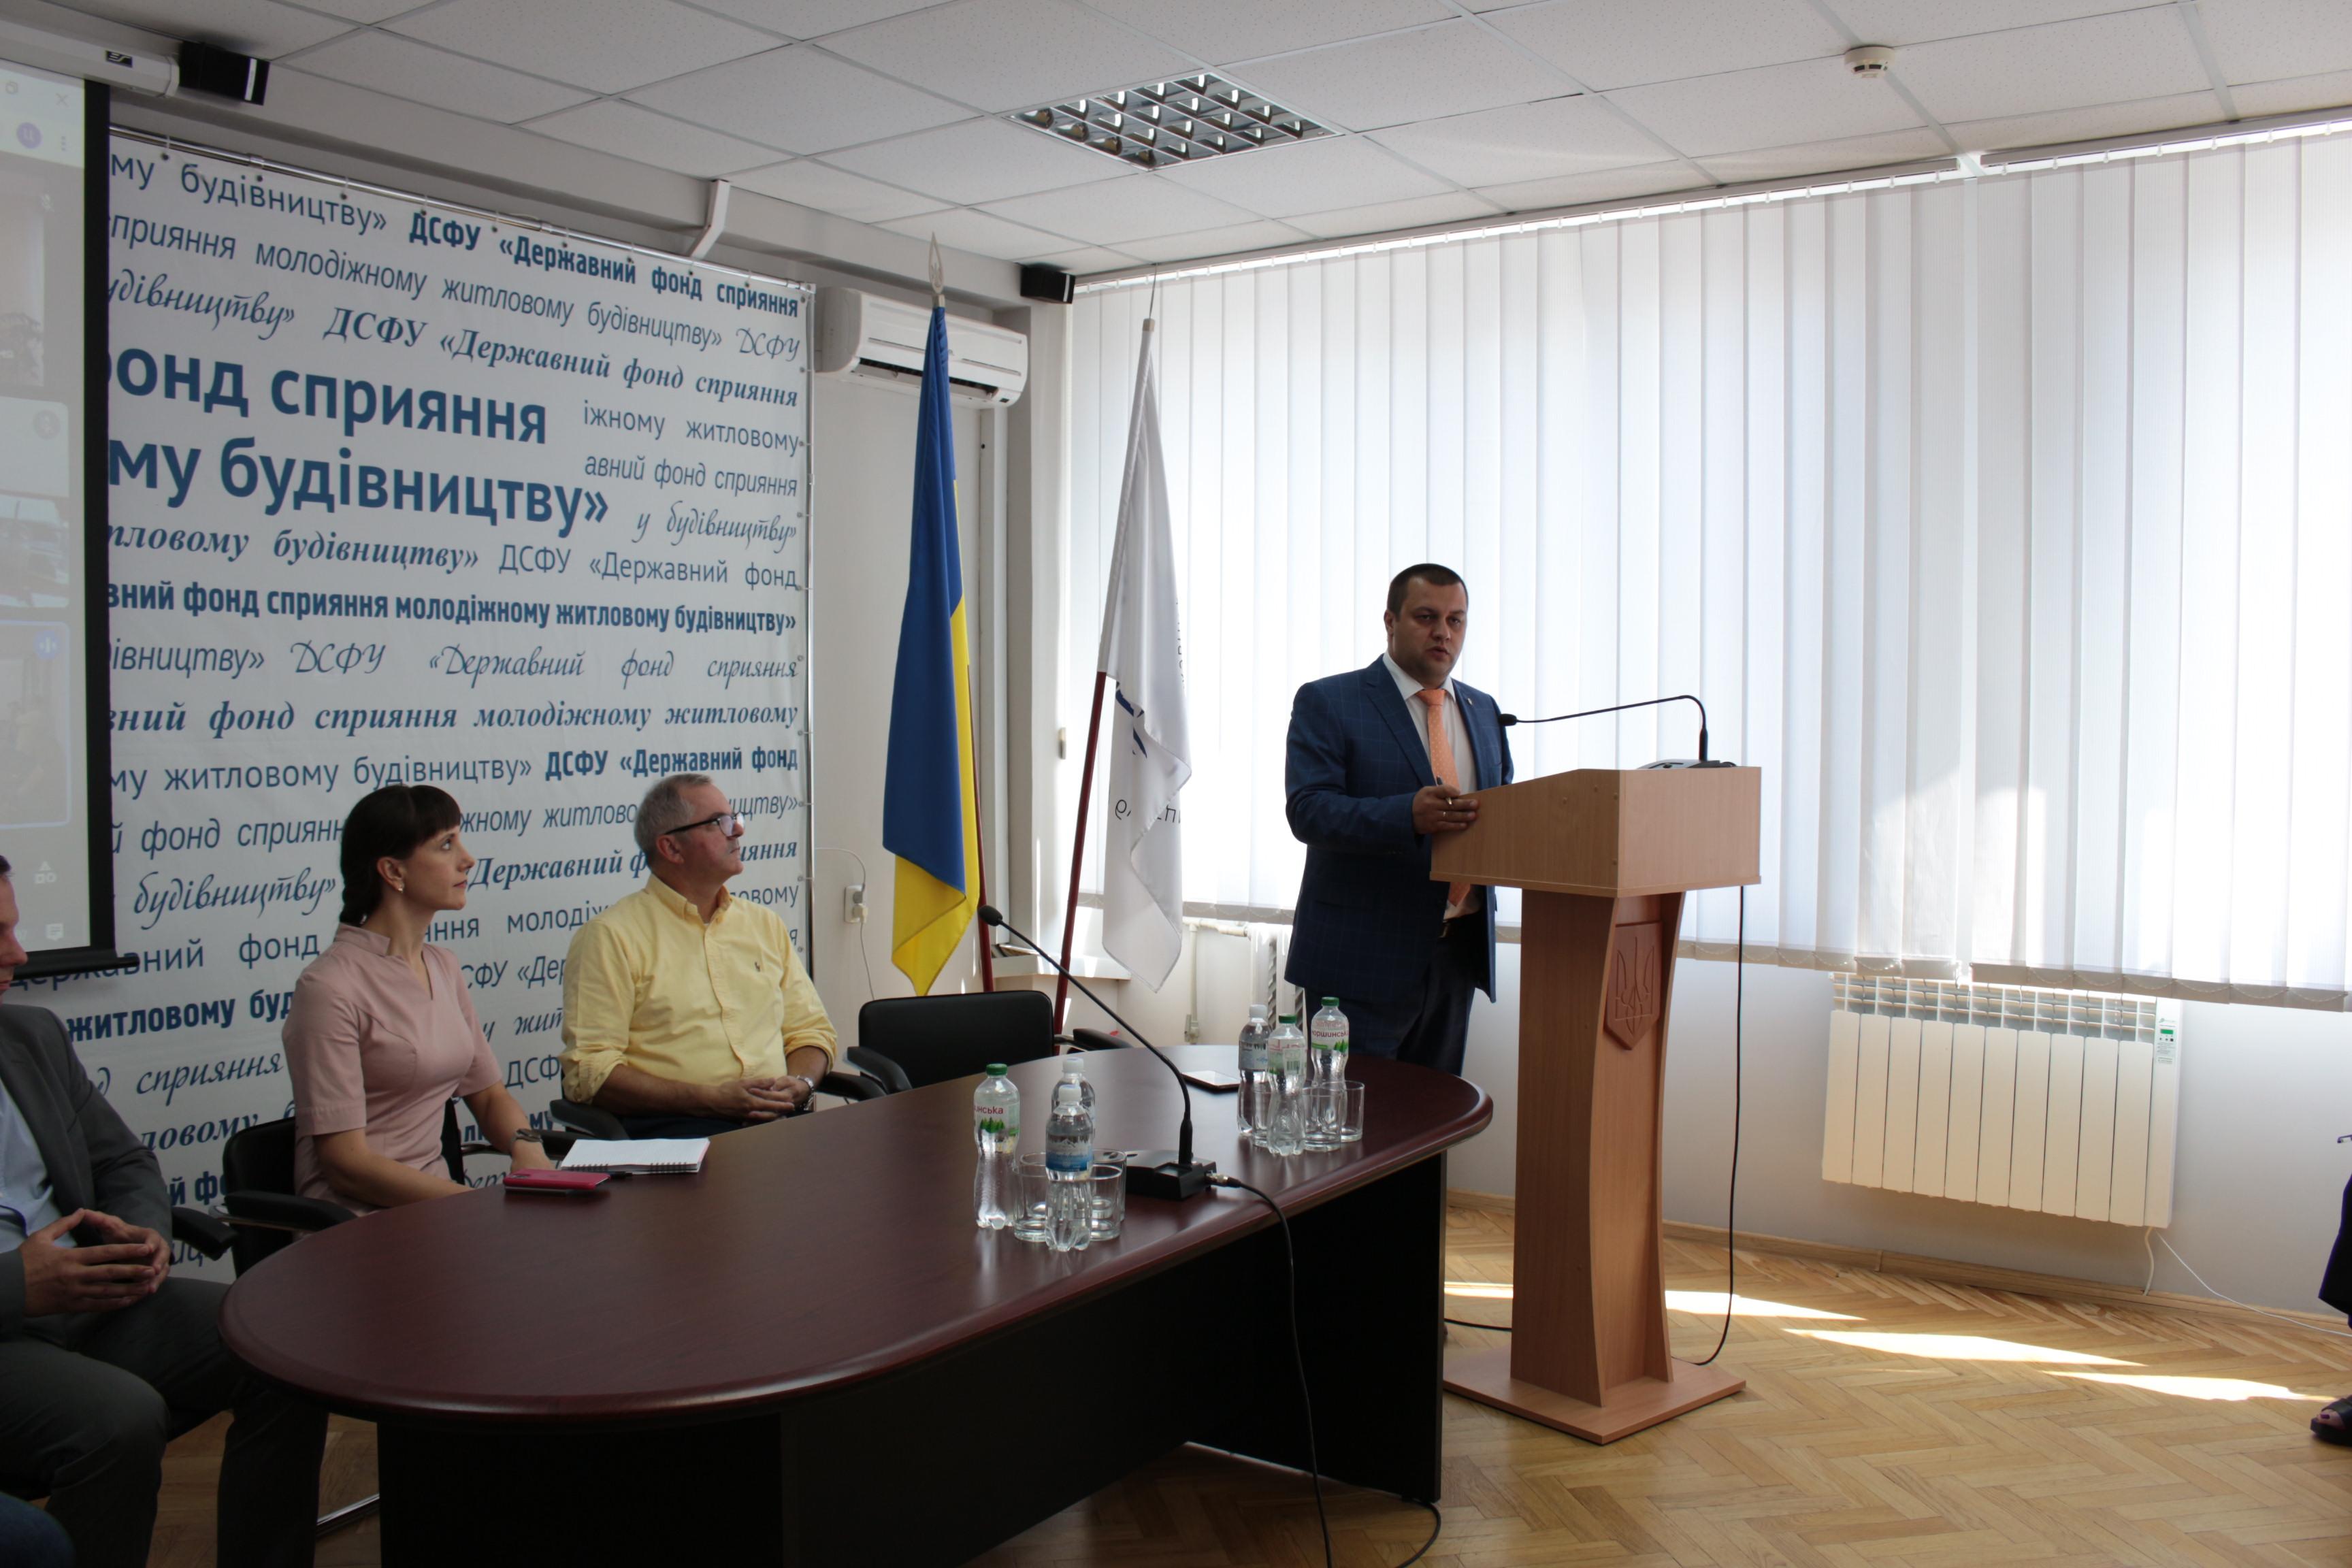 Serhii Komnatnyi: Cooperation with international partners unlocks new opportunities